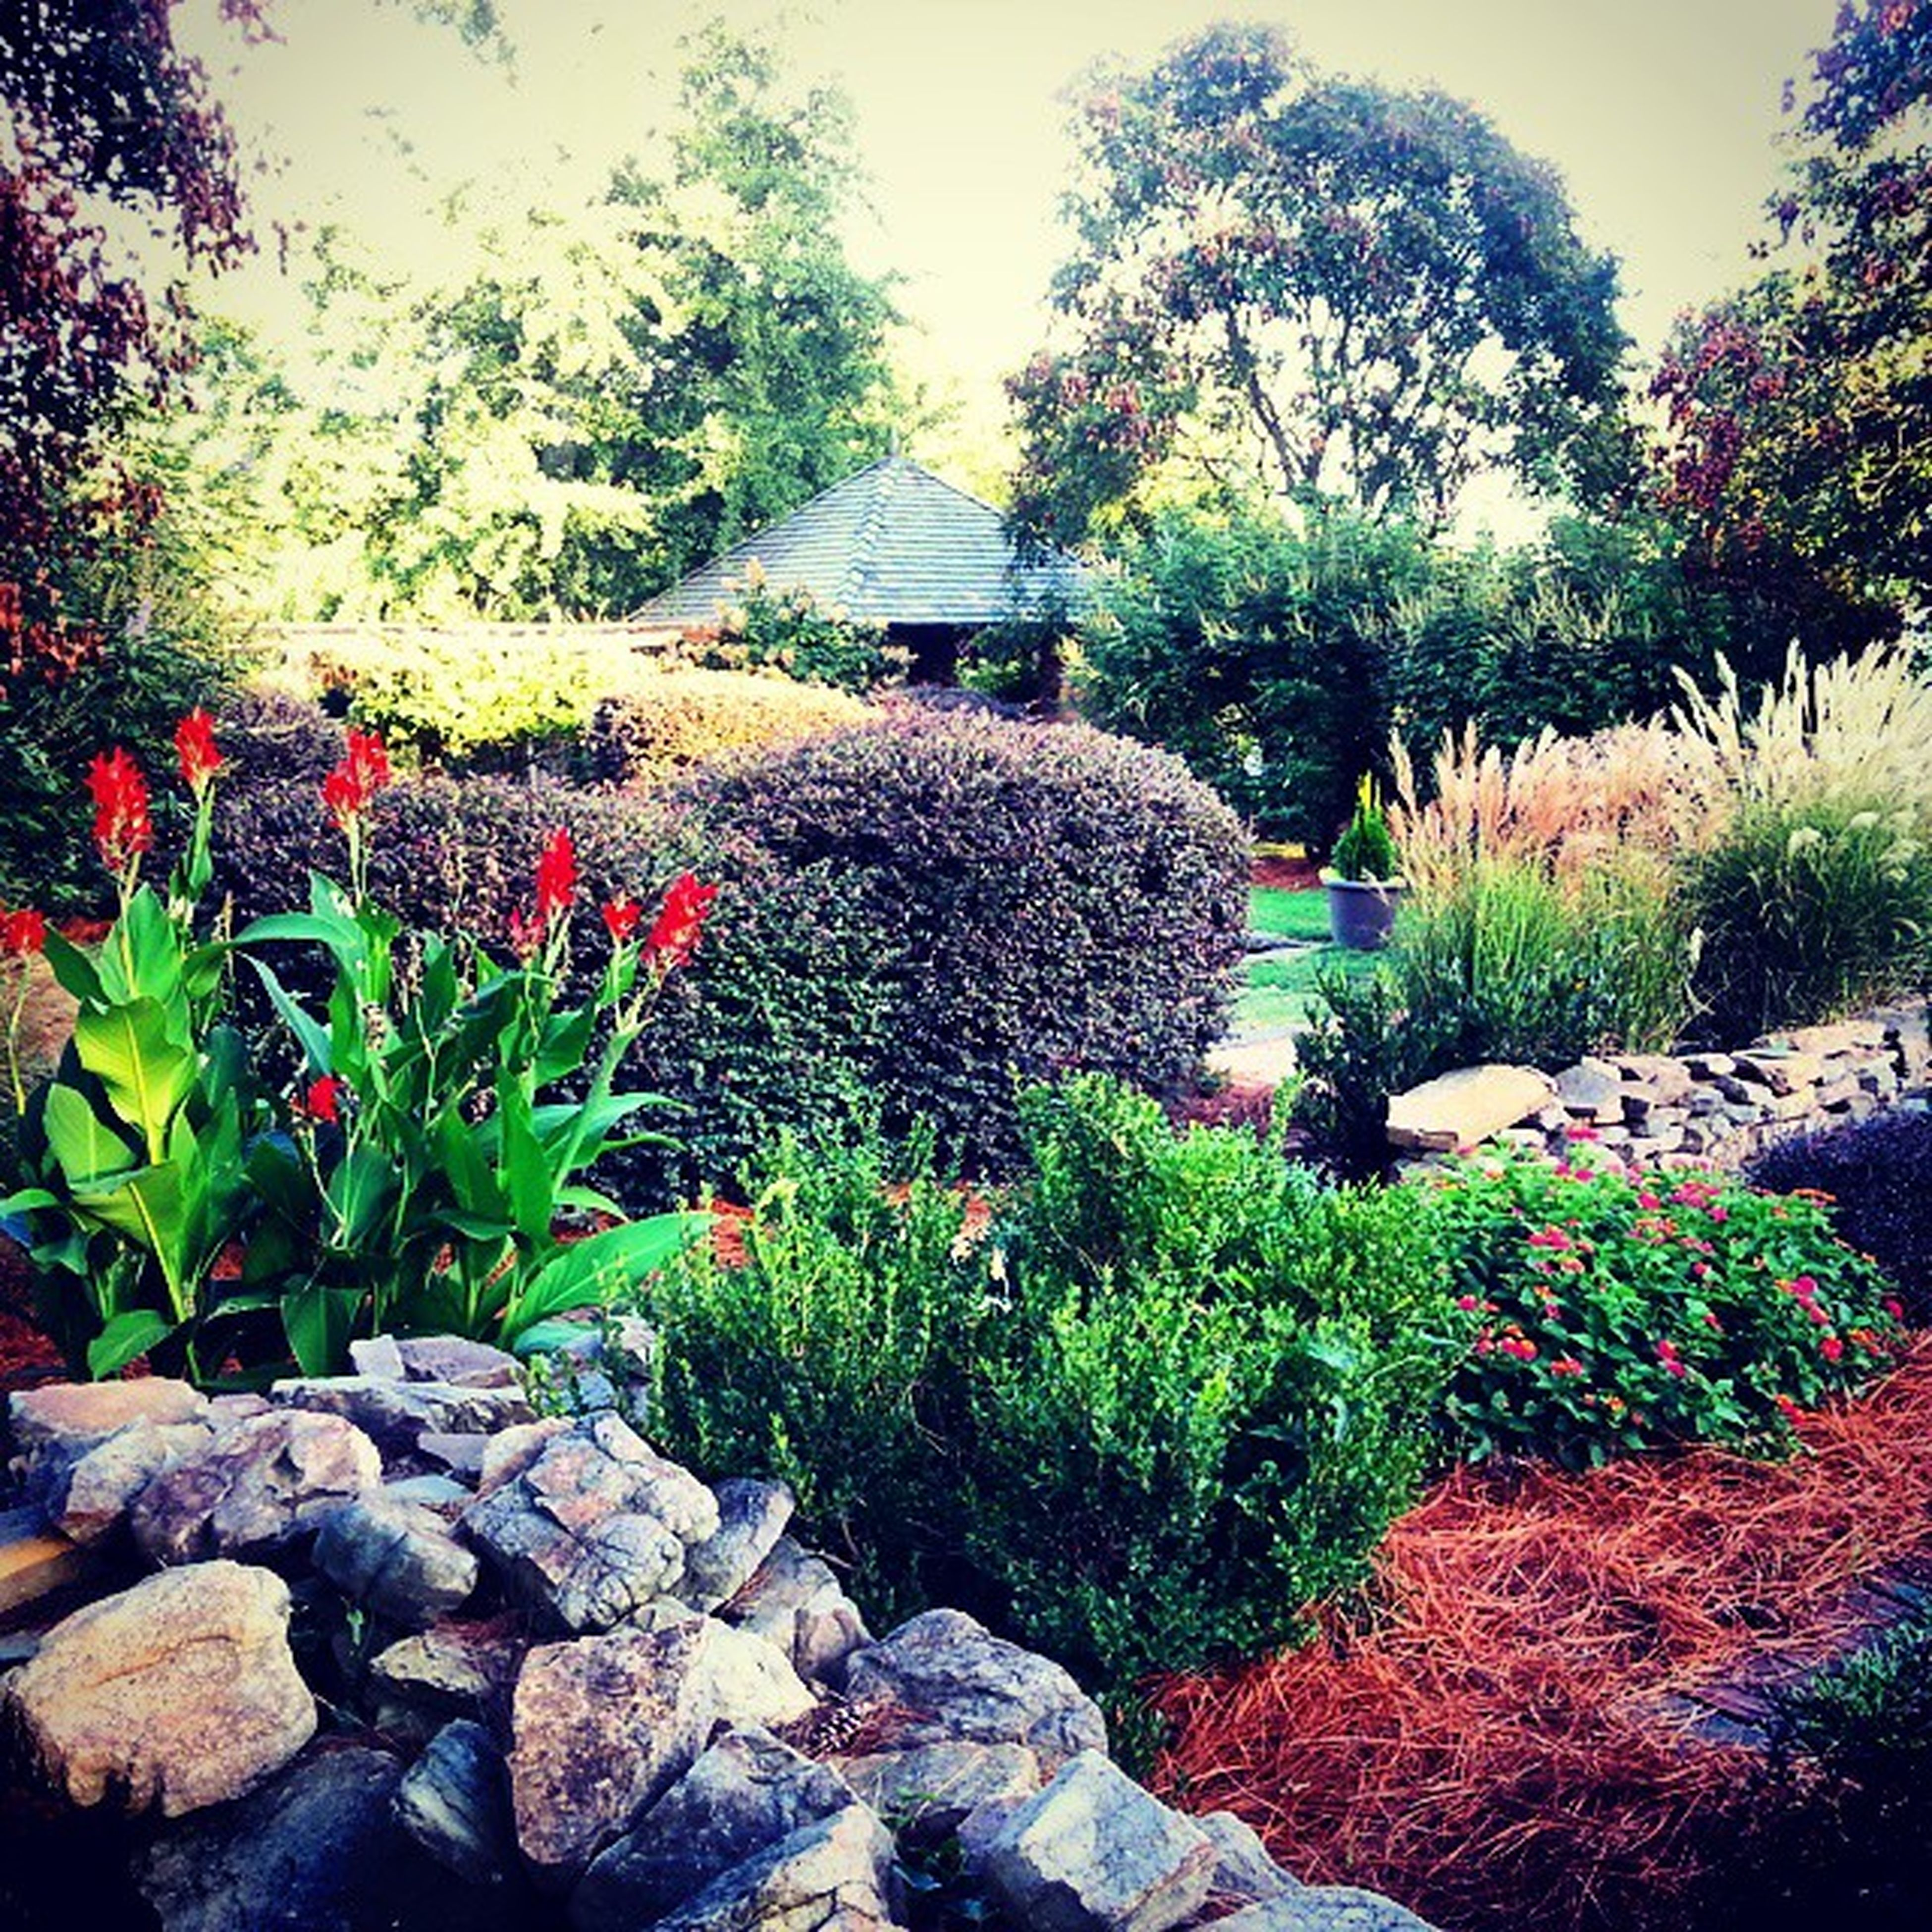 Lavendermountain Houseofdreams Gorgeousgardens